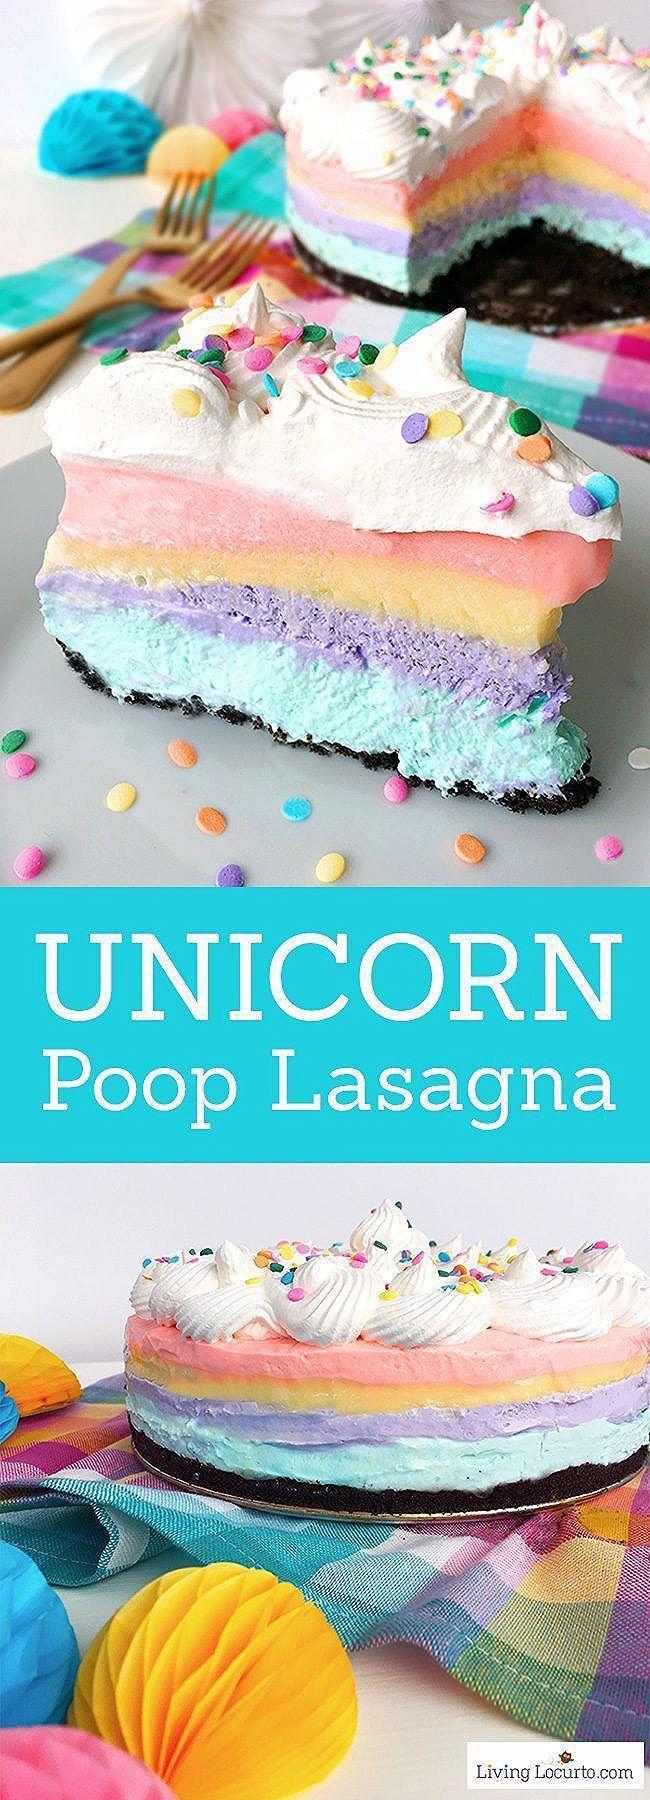 Photo of Unicorn Rainbow Dessert Lasagna